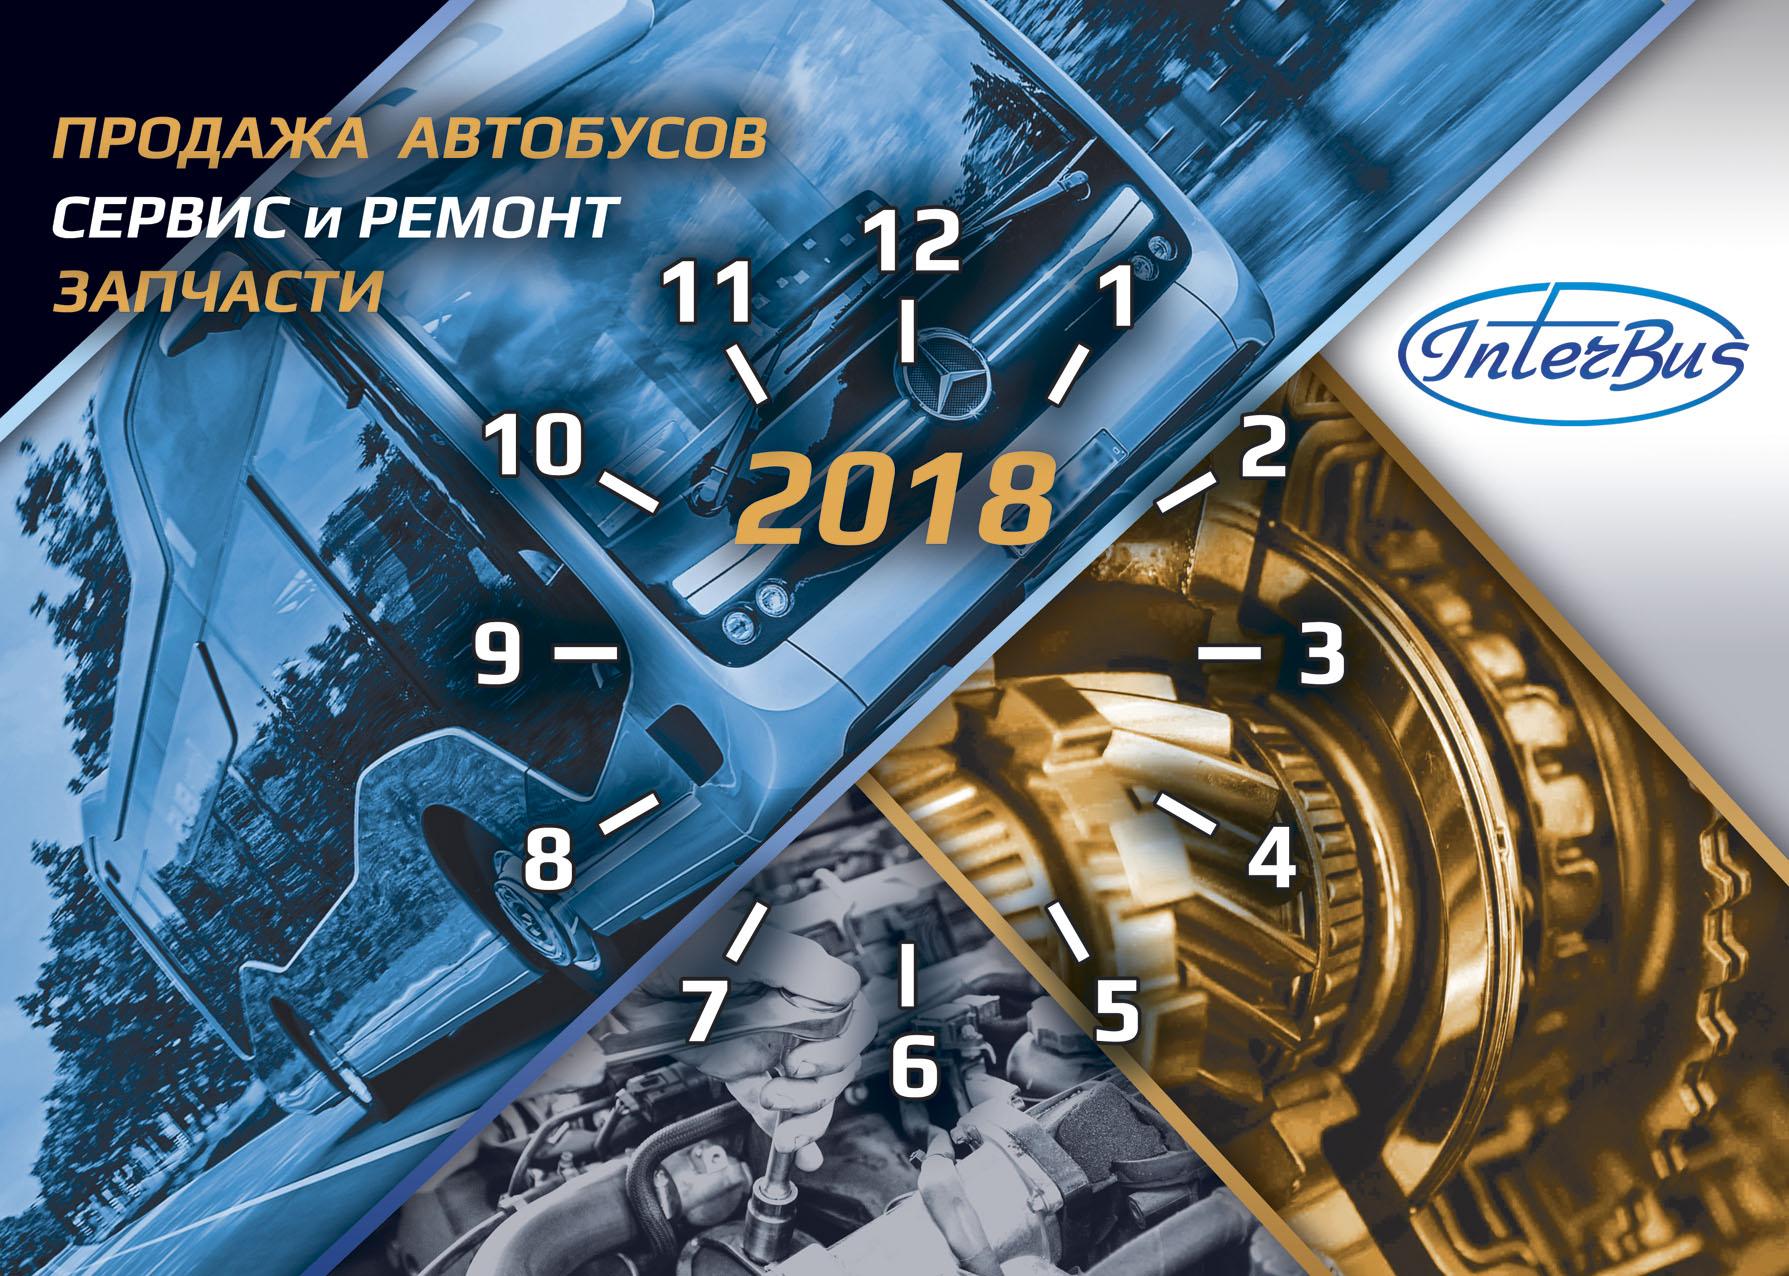 (01) Интербус 2018 Shapka 05